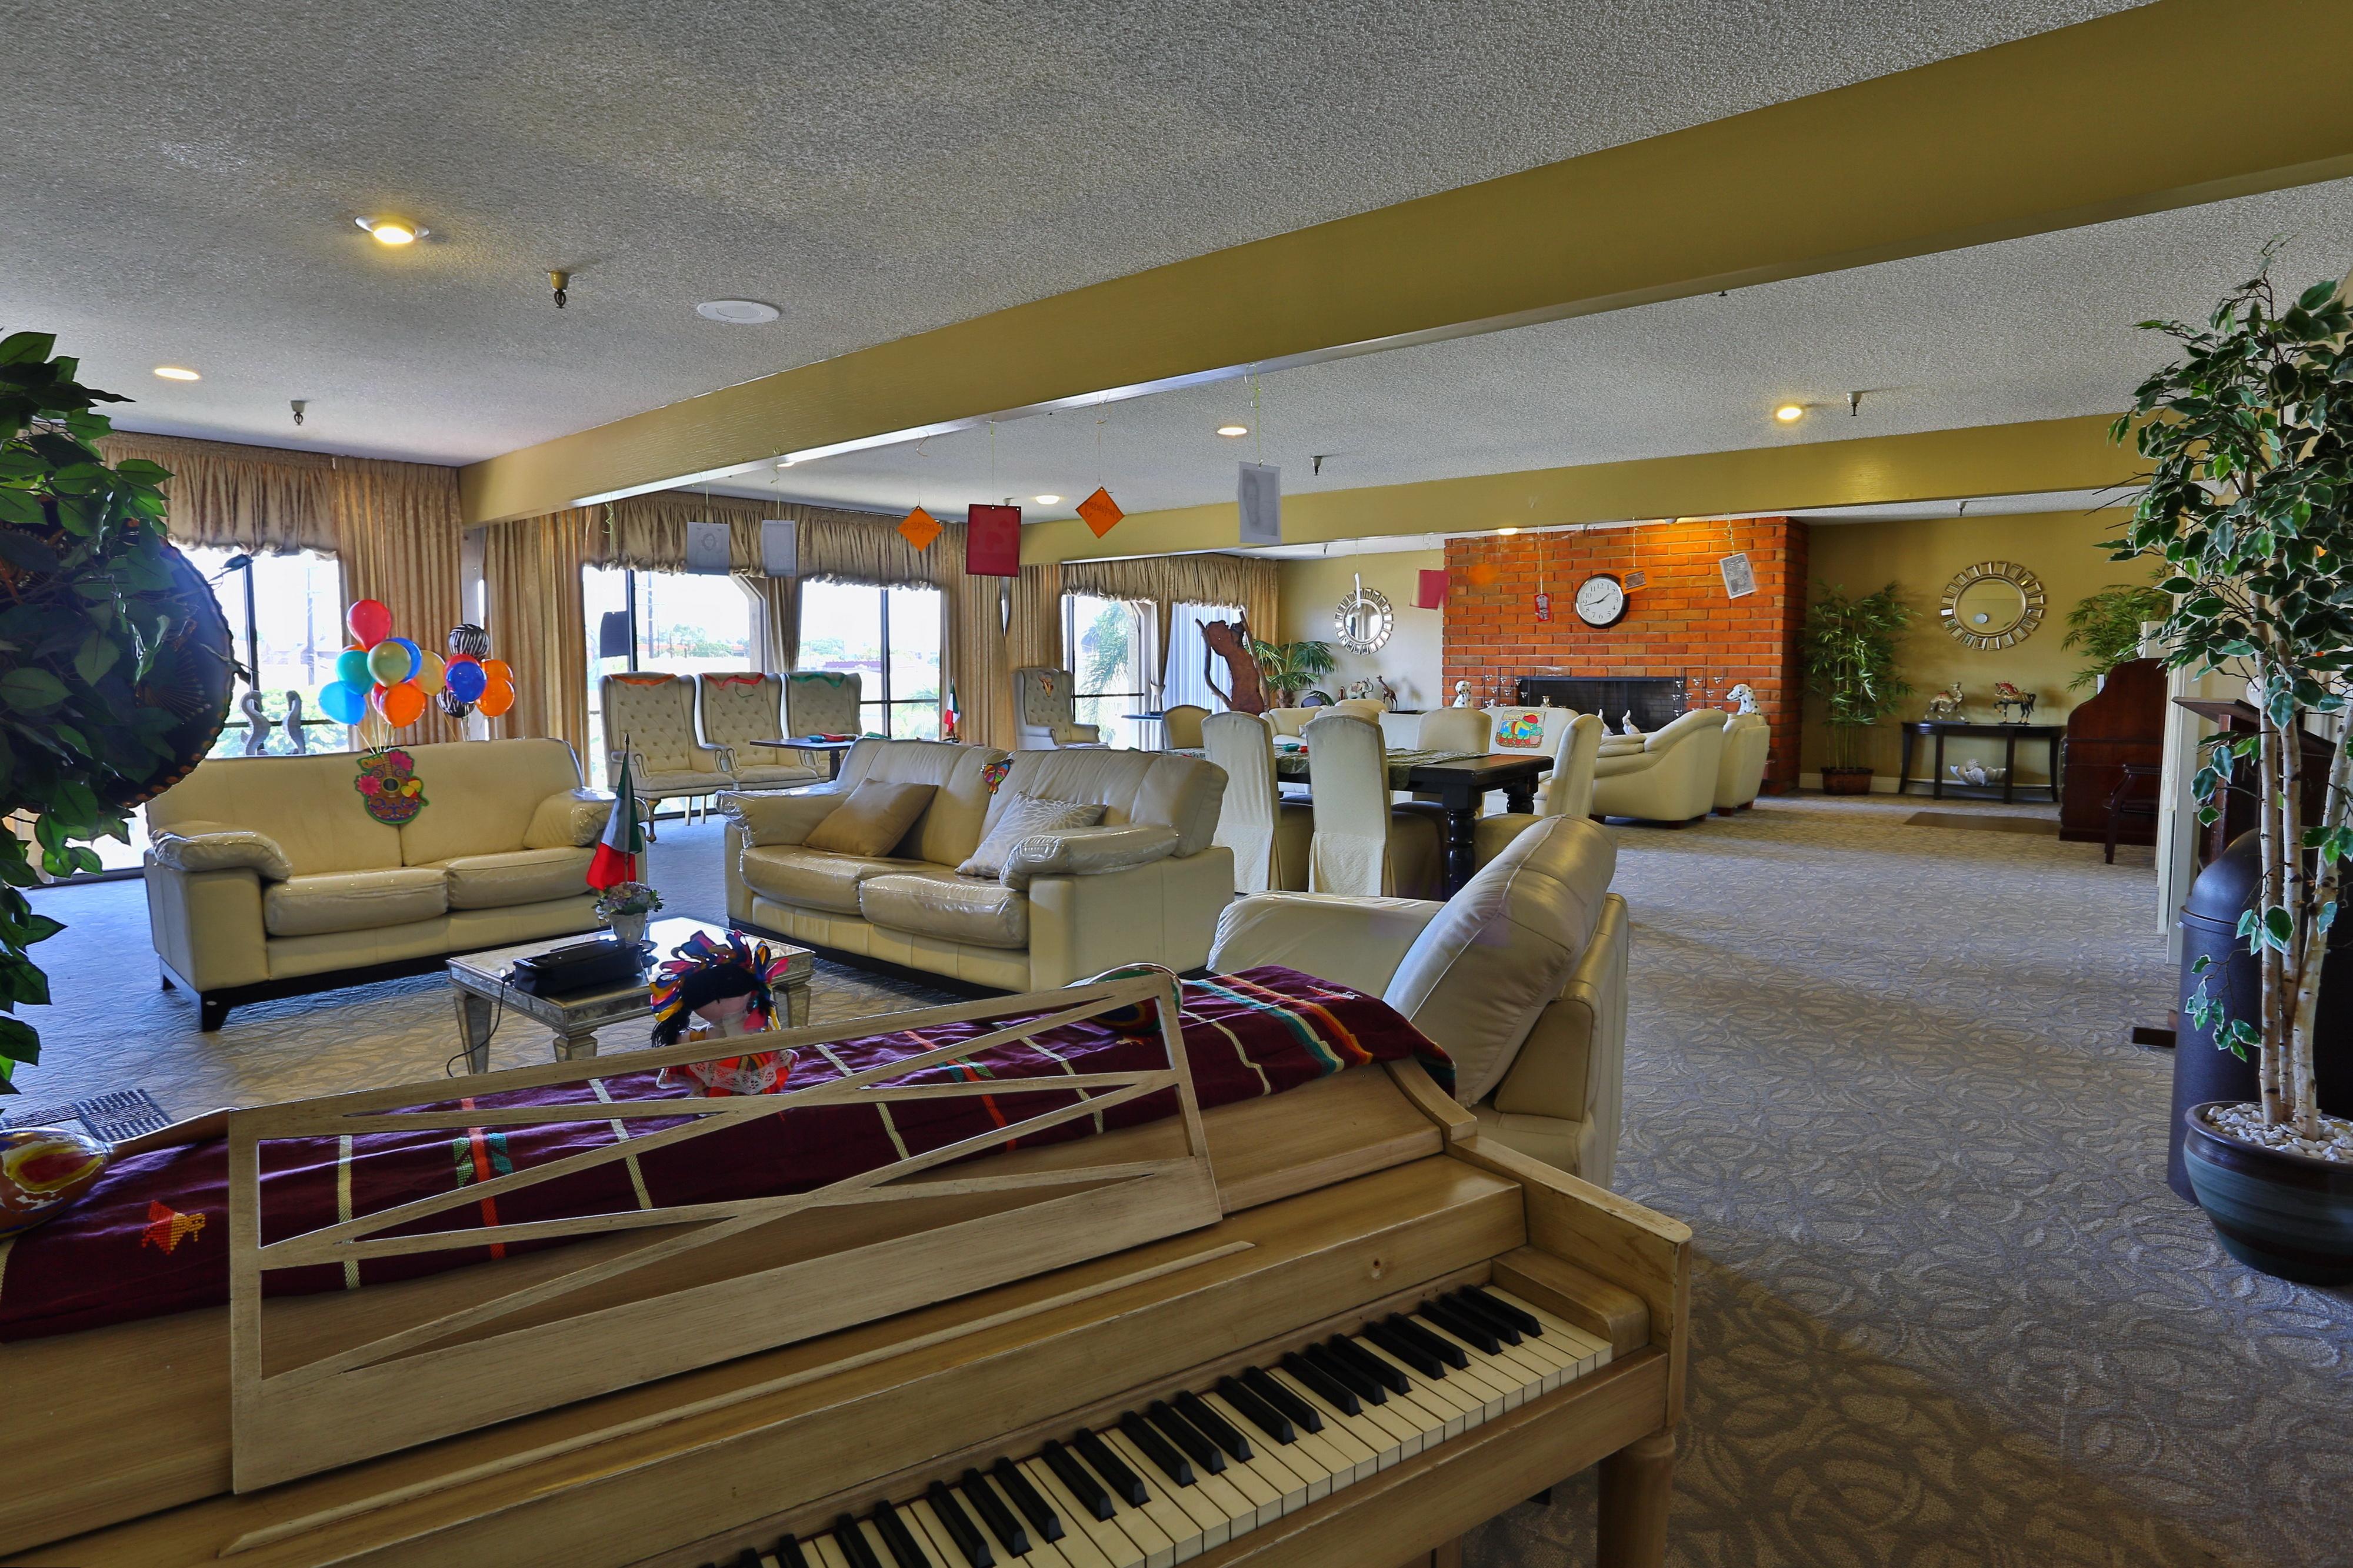 Villa Redondo Activity Room